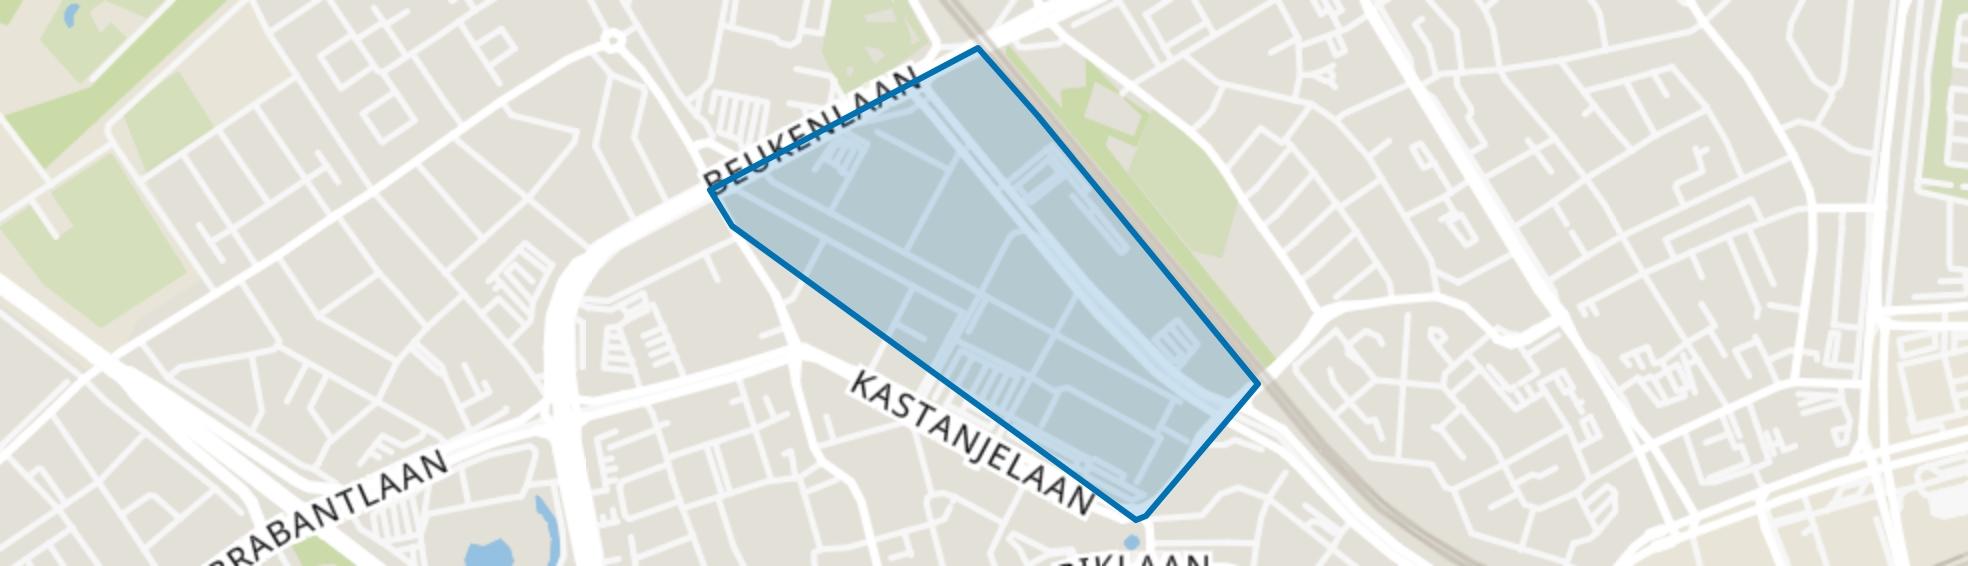 Strijp S, Eindhoven map